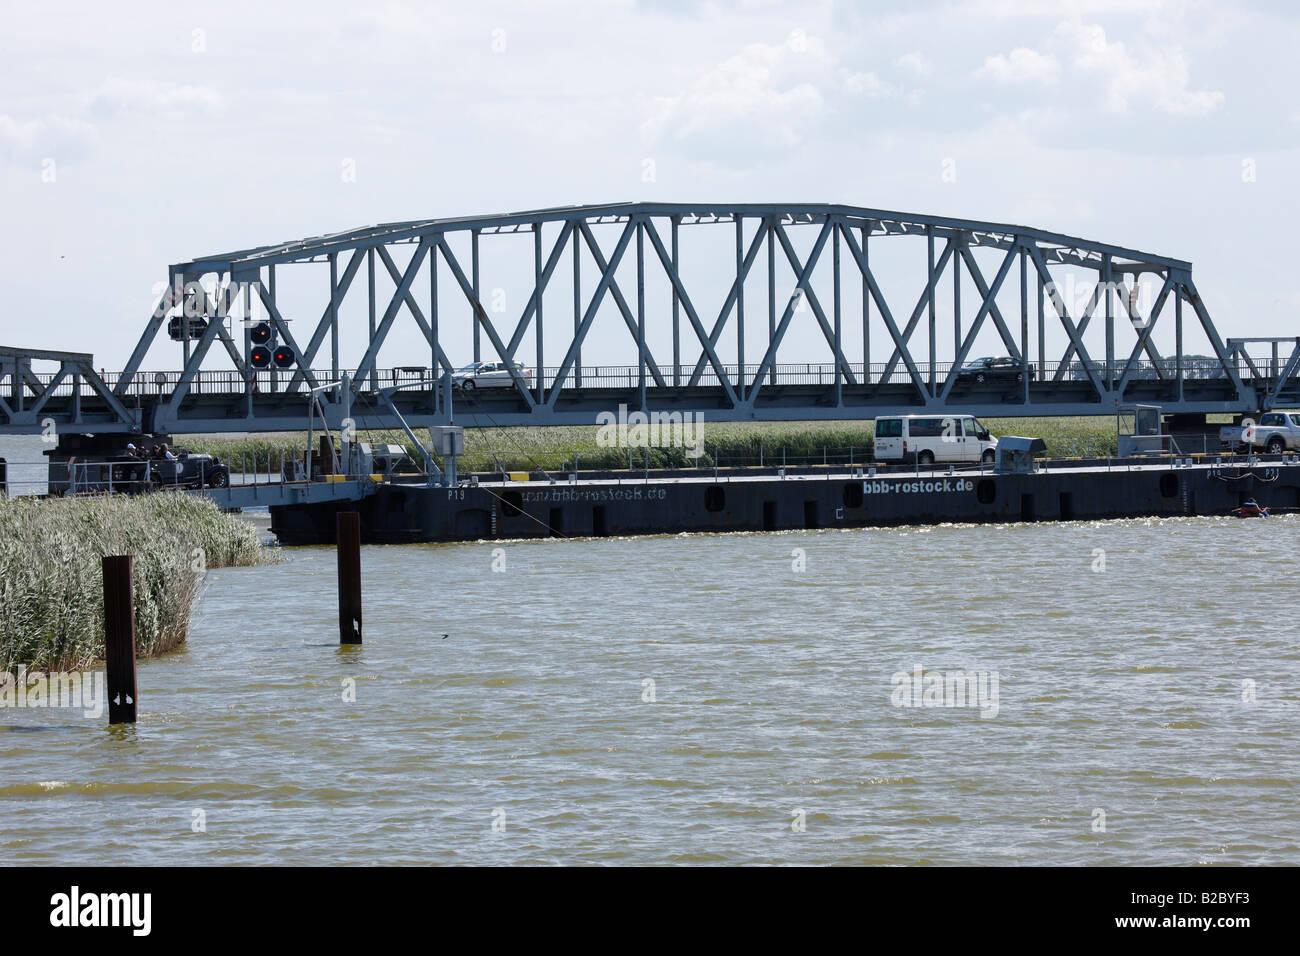 Meiningen Bridge, old railway swingbridge, Bodstedt Bodden, Western Pomerania Lagoon Area National Park, Mecklenburg - Stock Image